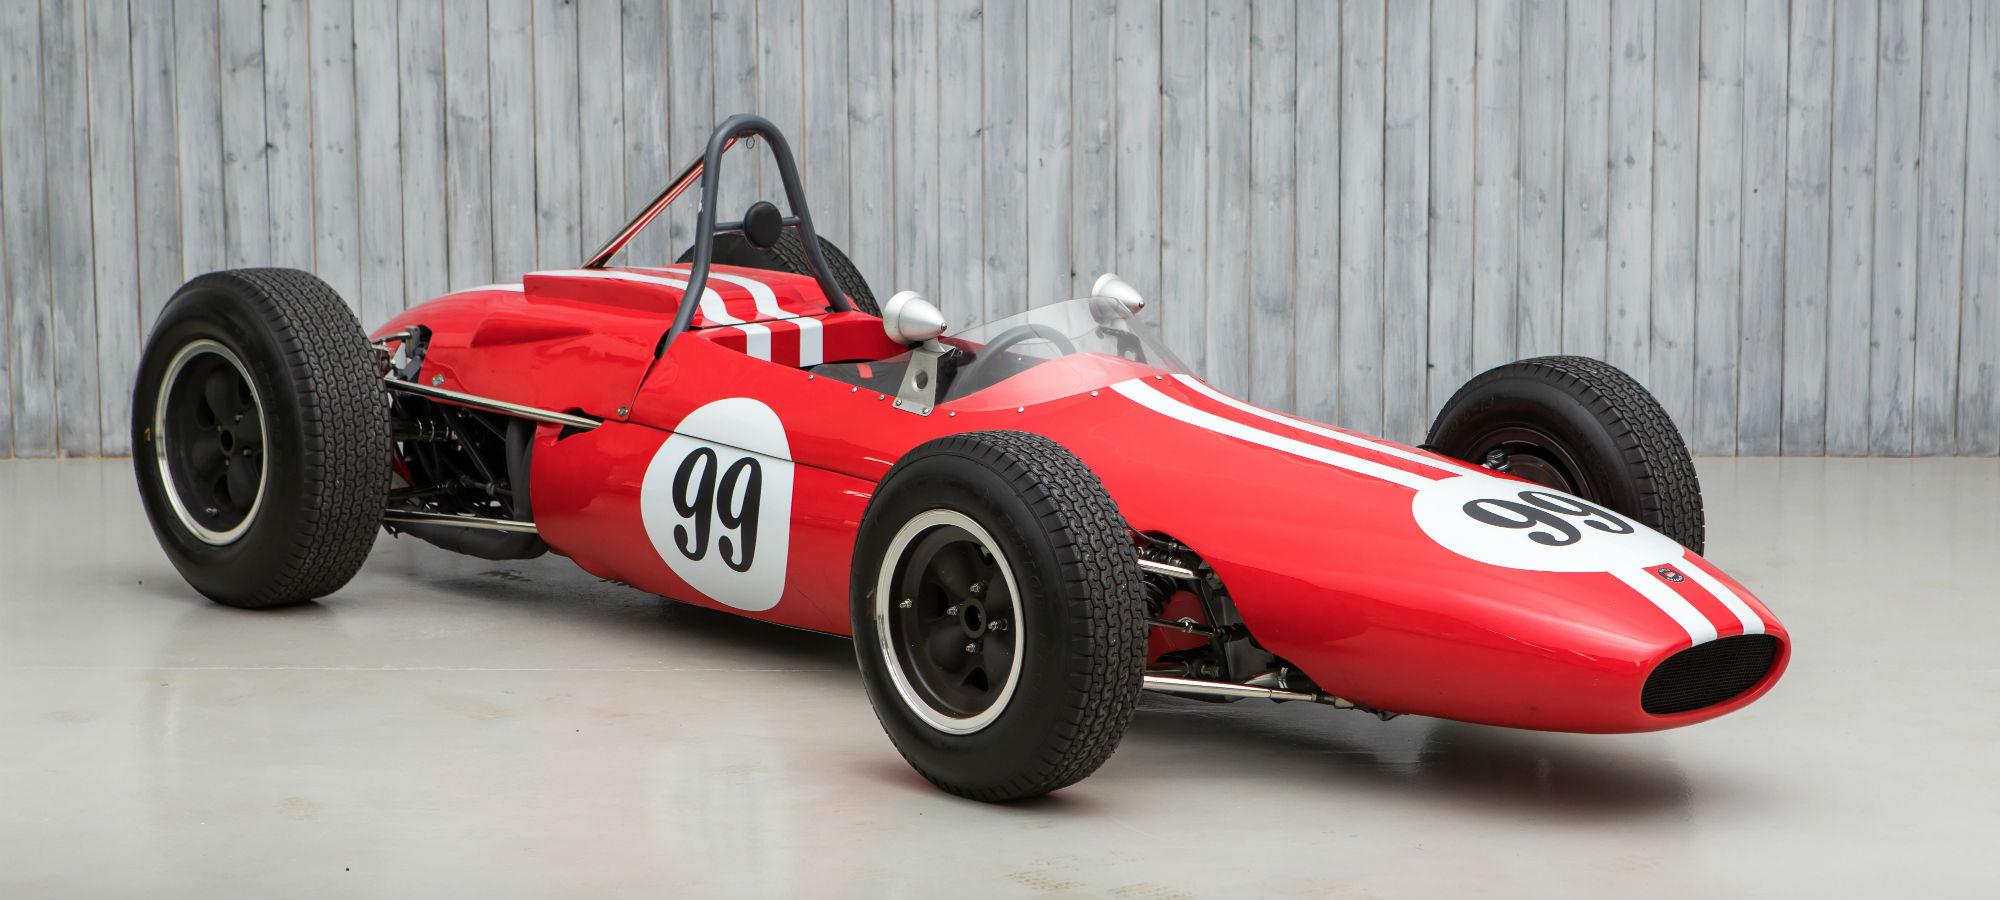 The Ex - Charles Vögele, Swiss Champion 1963 Brabham BT4